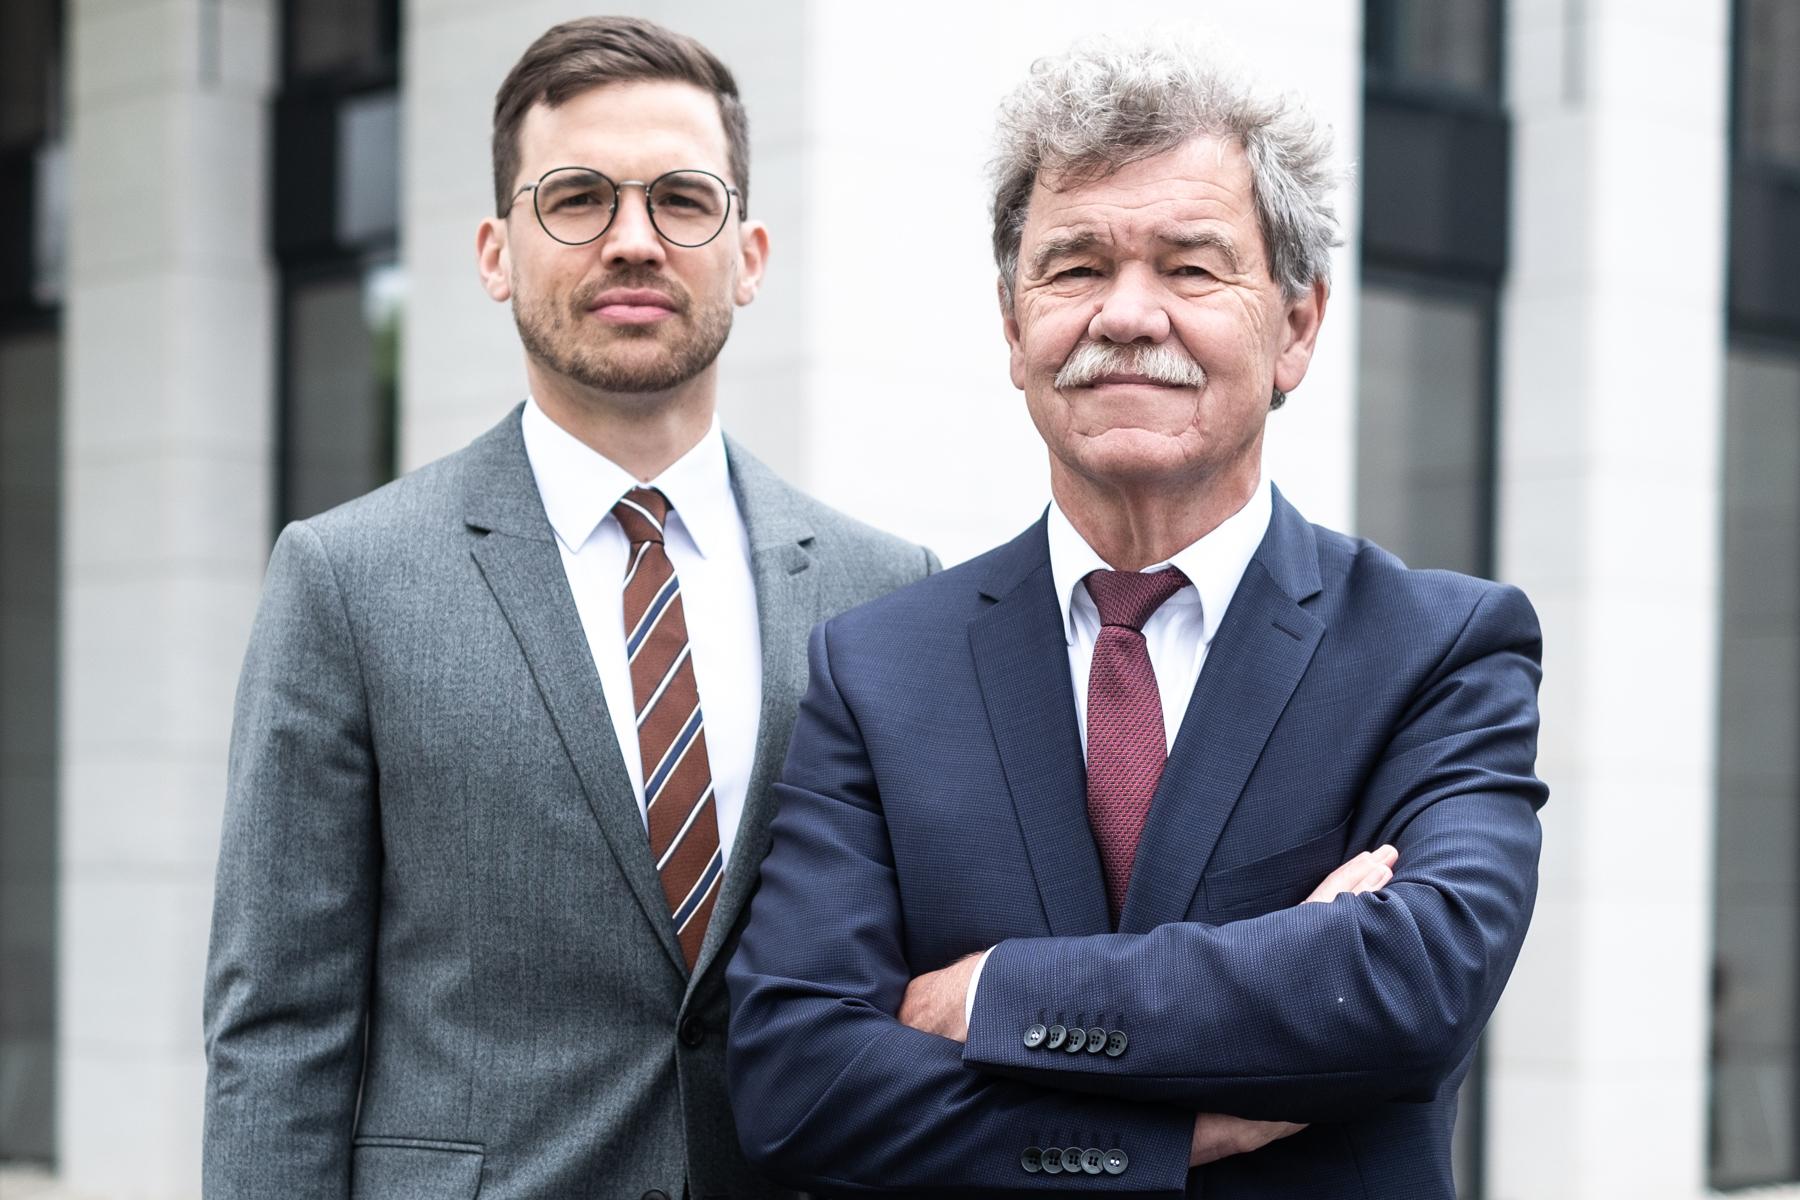 Simon und Norbert Wagner, Steuerberater